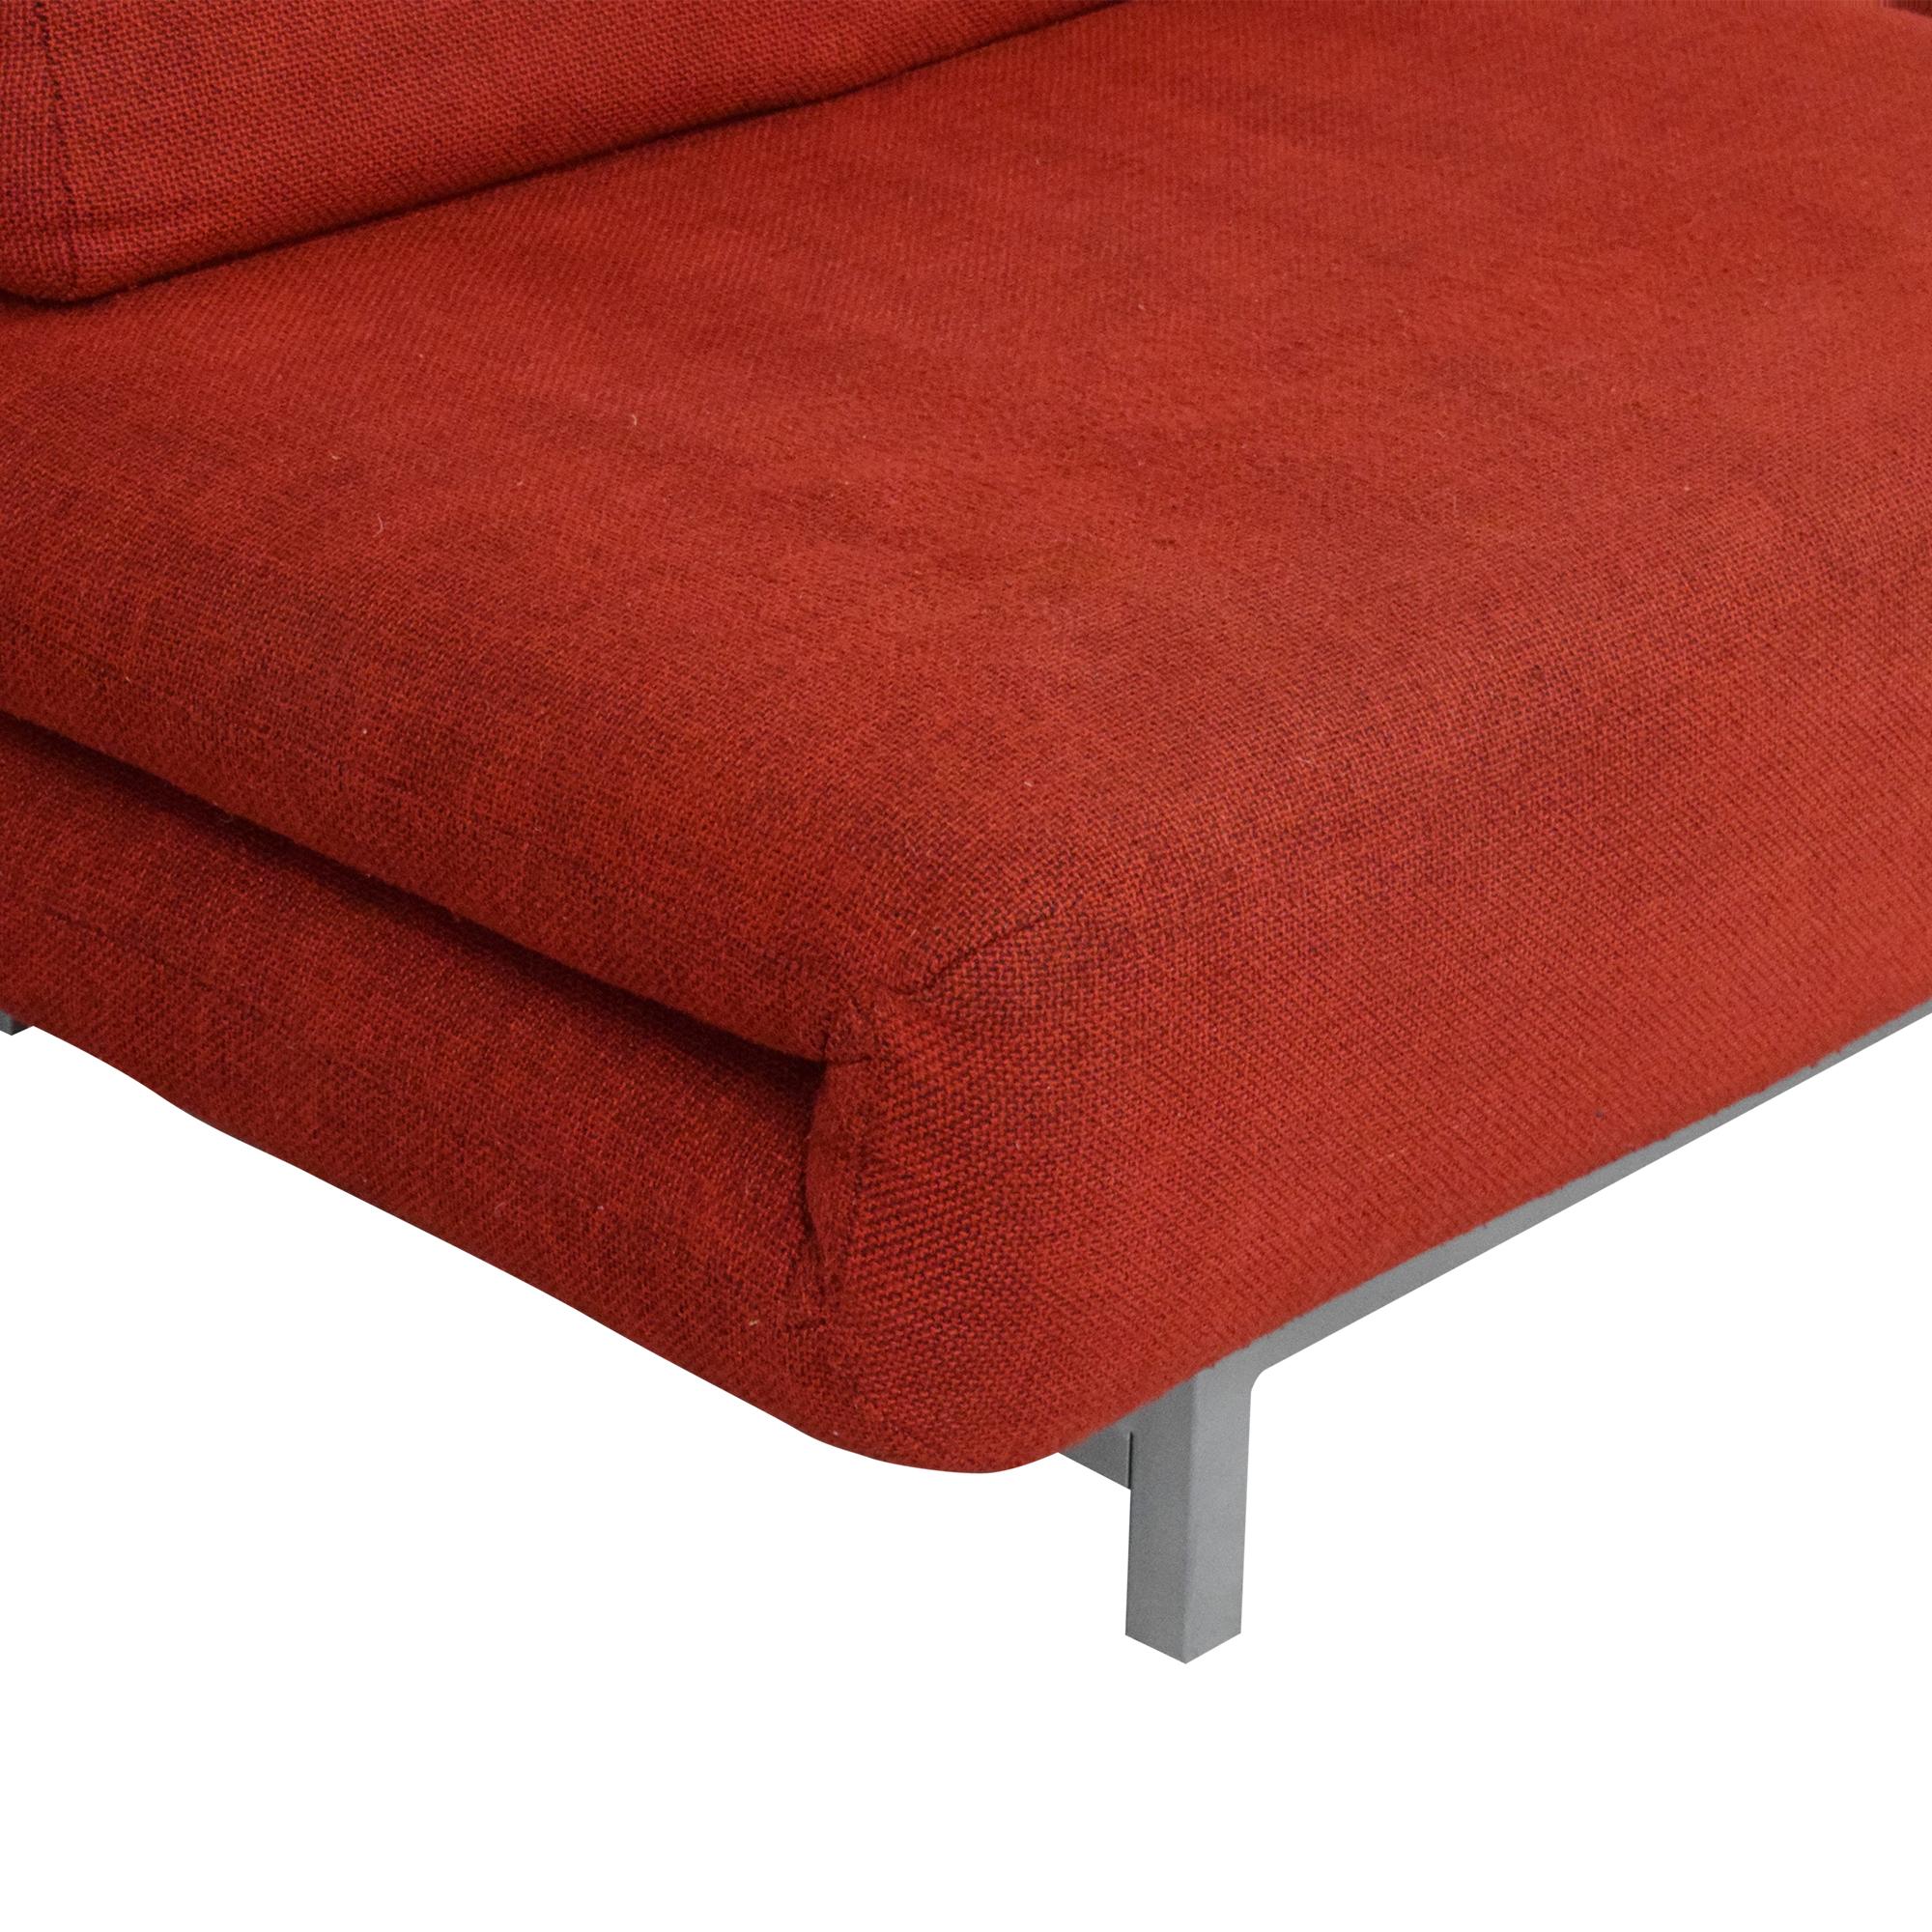 IDO IDO Swivel Convertible Sofa Bed dimensions